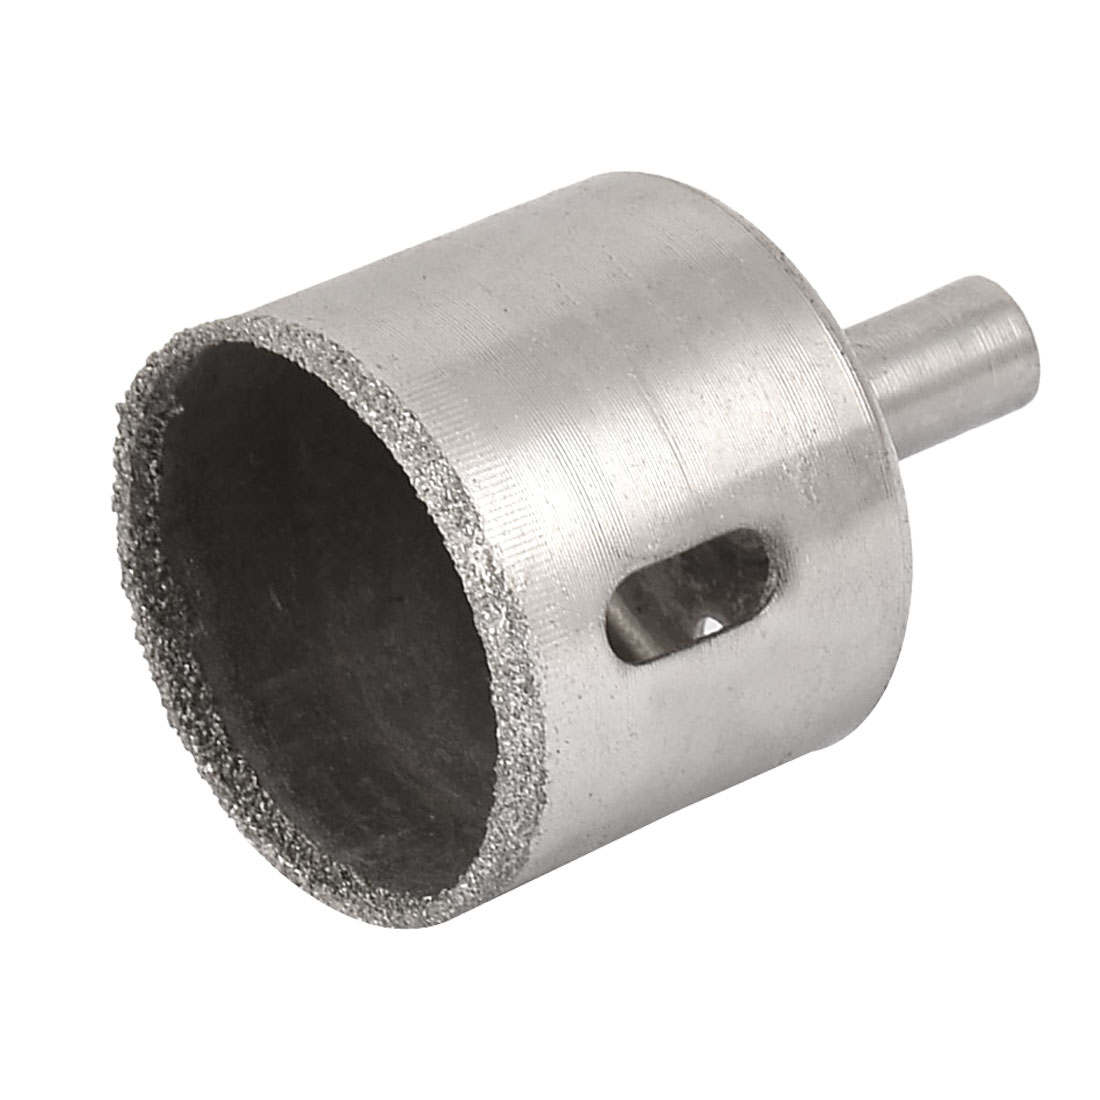 Tile Glass Metal Hole Saw Diamond Core Drill Bit 35mm Cutting Diameter